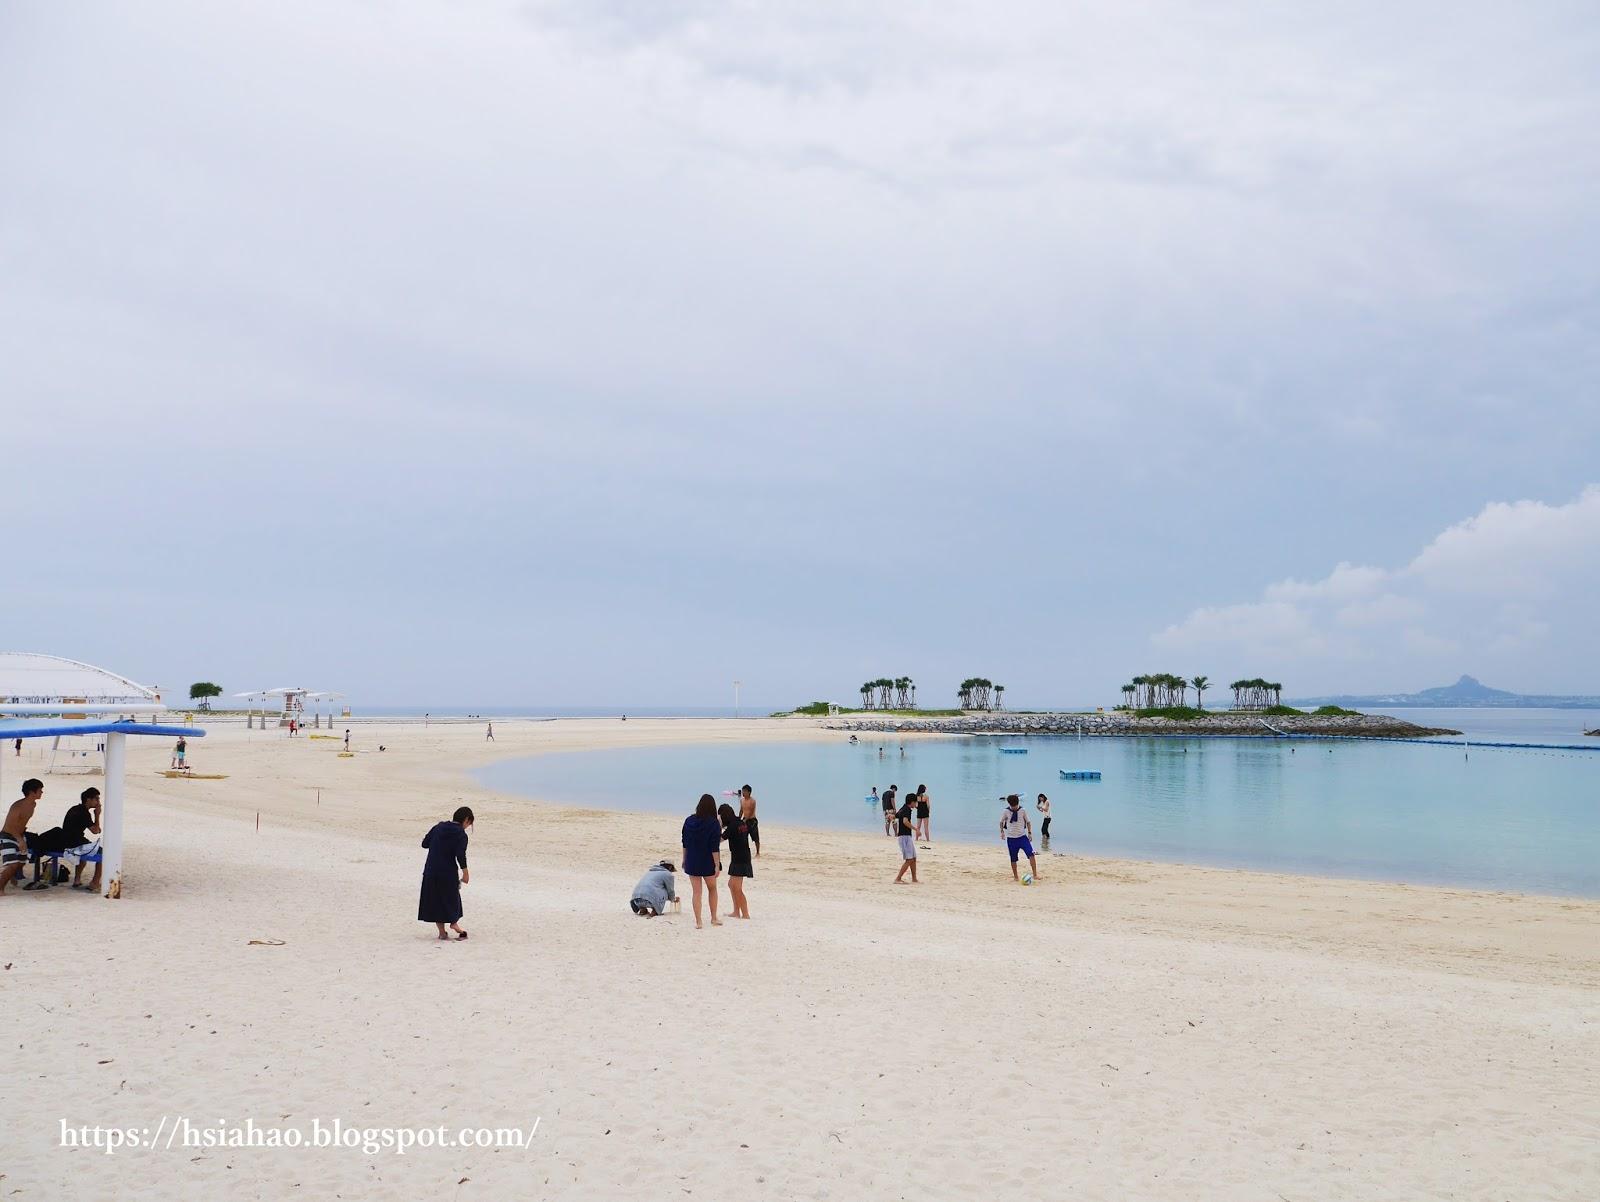 沖繩-海洋博公園-翡翠海灘-エメラルドビーチ-Emeraid-Beach-海濱長廊-海洋博公園景點-自由行-旅遊-旅行-okinawa-ocean-expo-park